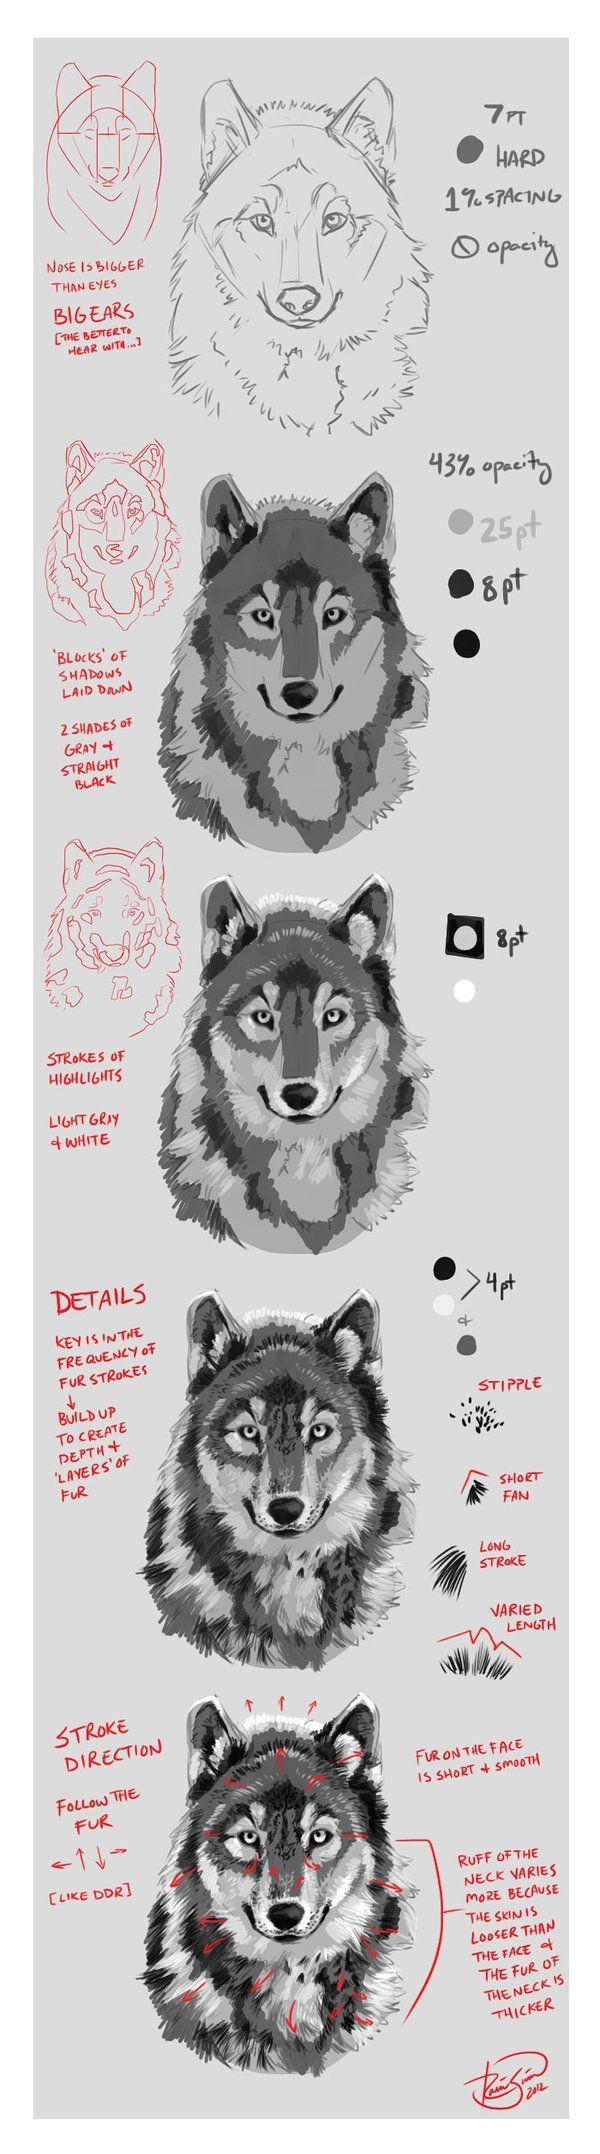 Wolf Portrait Mini-Tutorial by Junryou-na-Kokoro.deviantart.com on @deviantART: